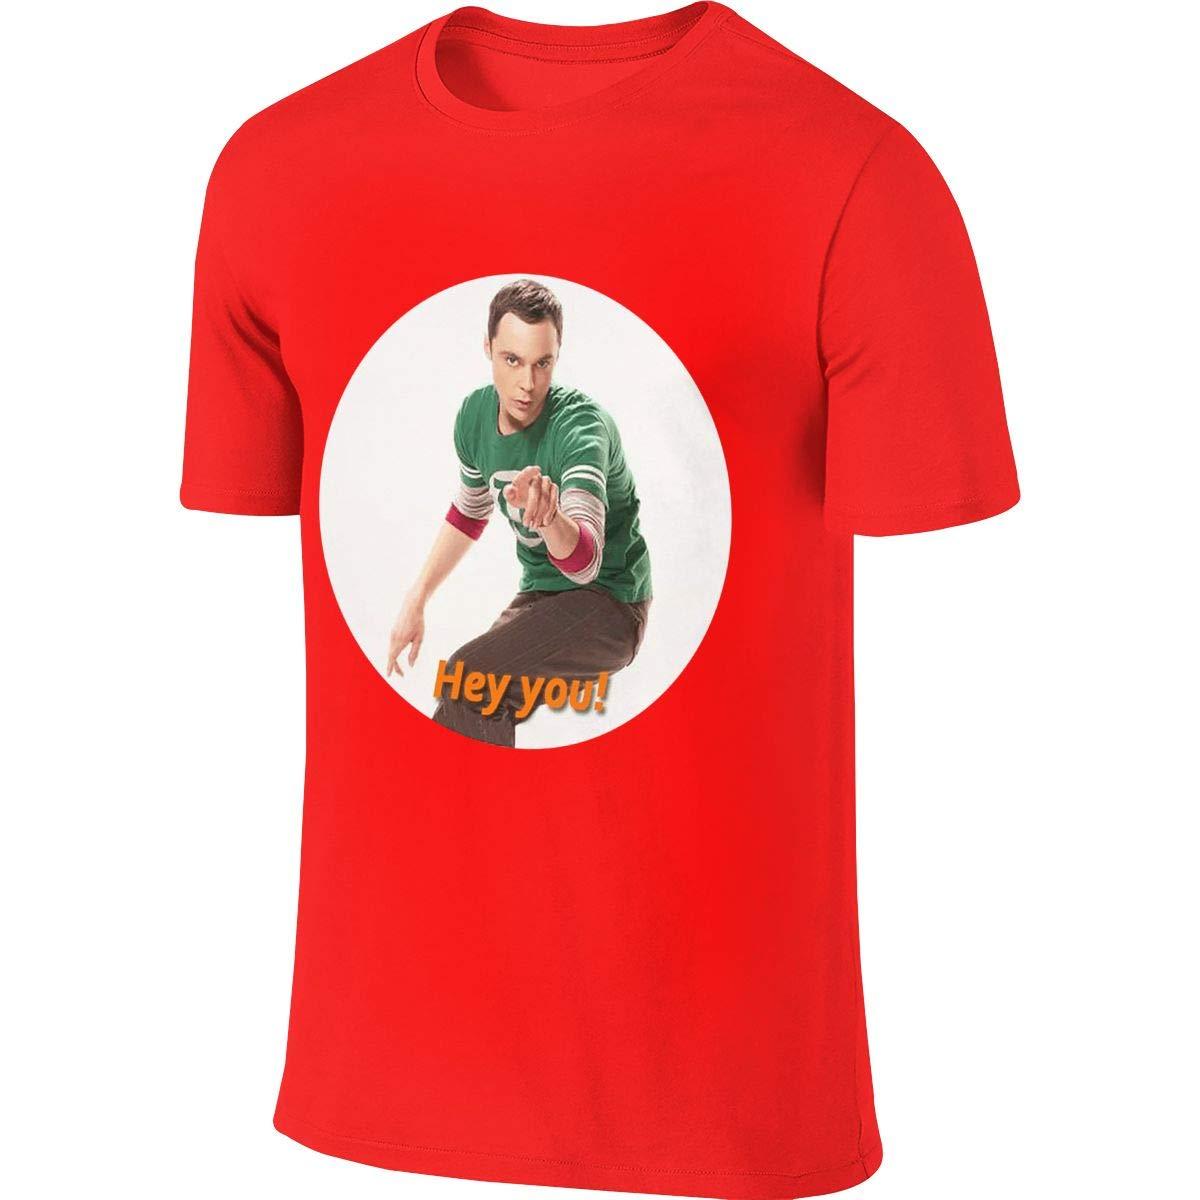 Revess Design Novelty Tees The Big Bang Theory Sheldon Cooper T Shirt